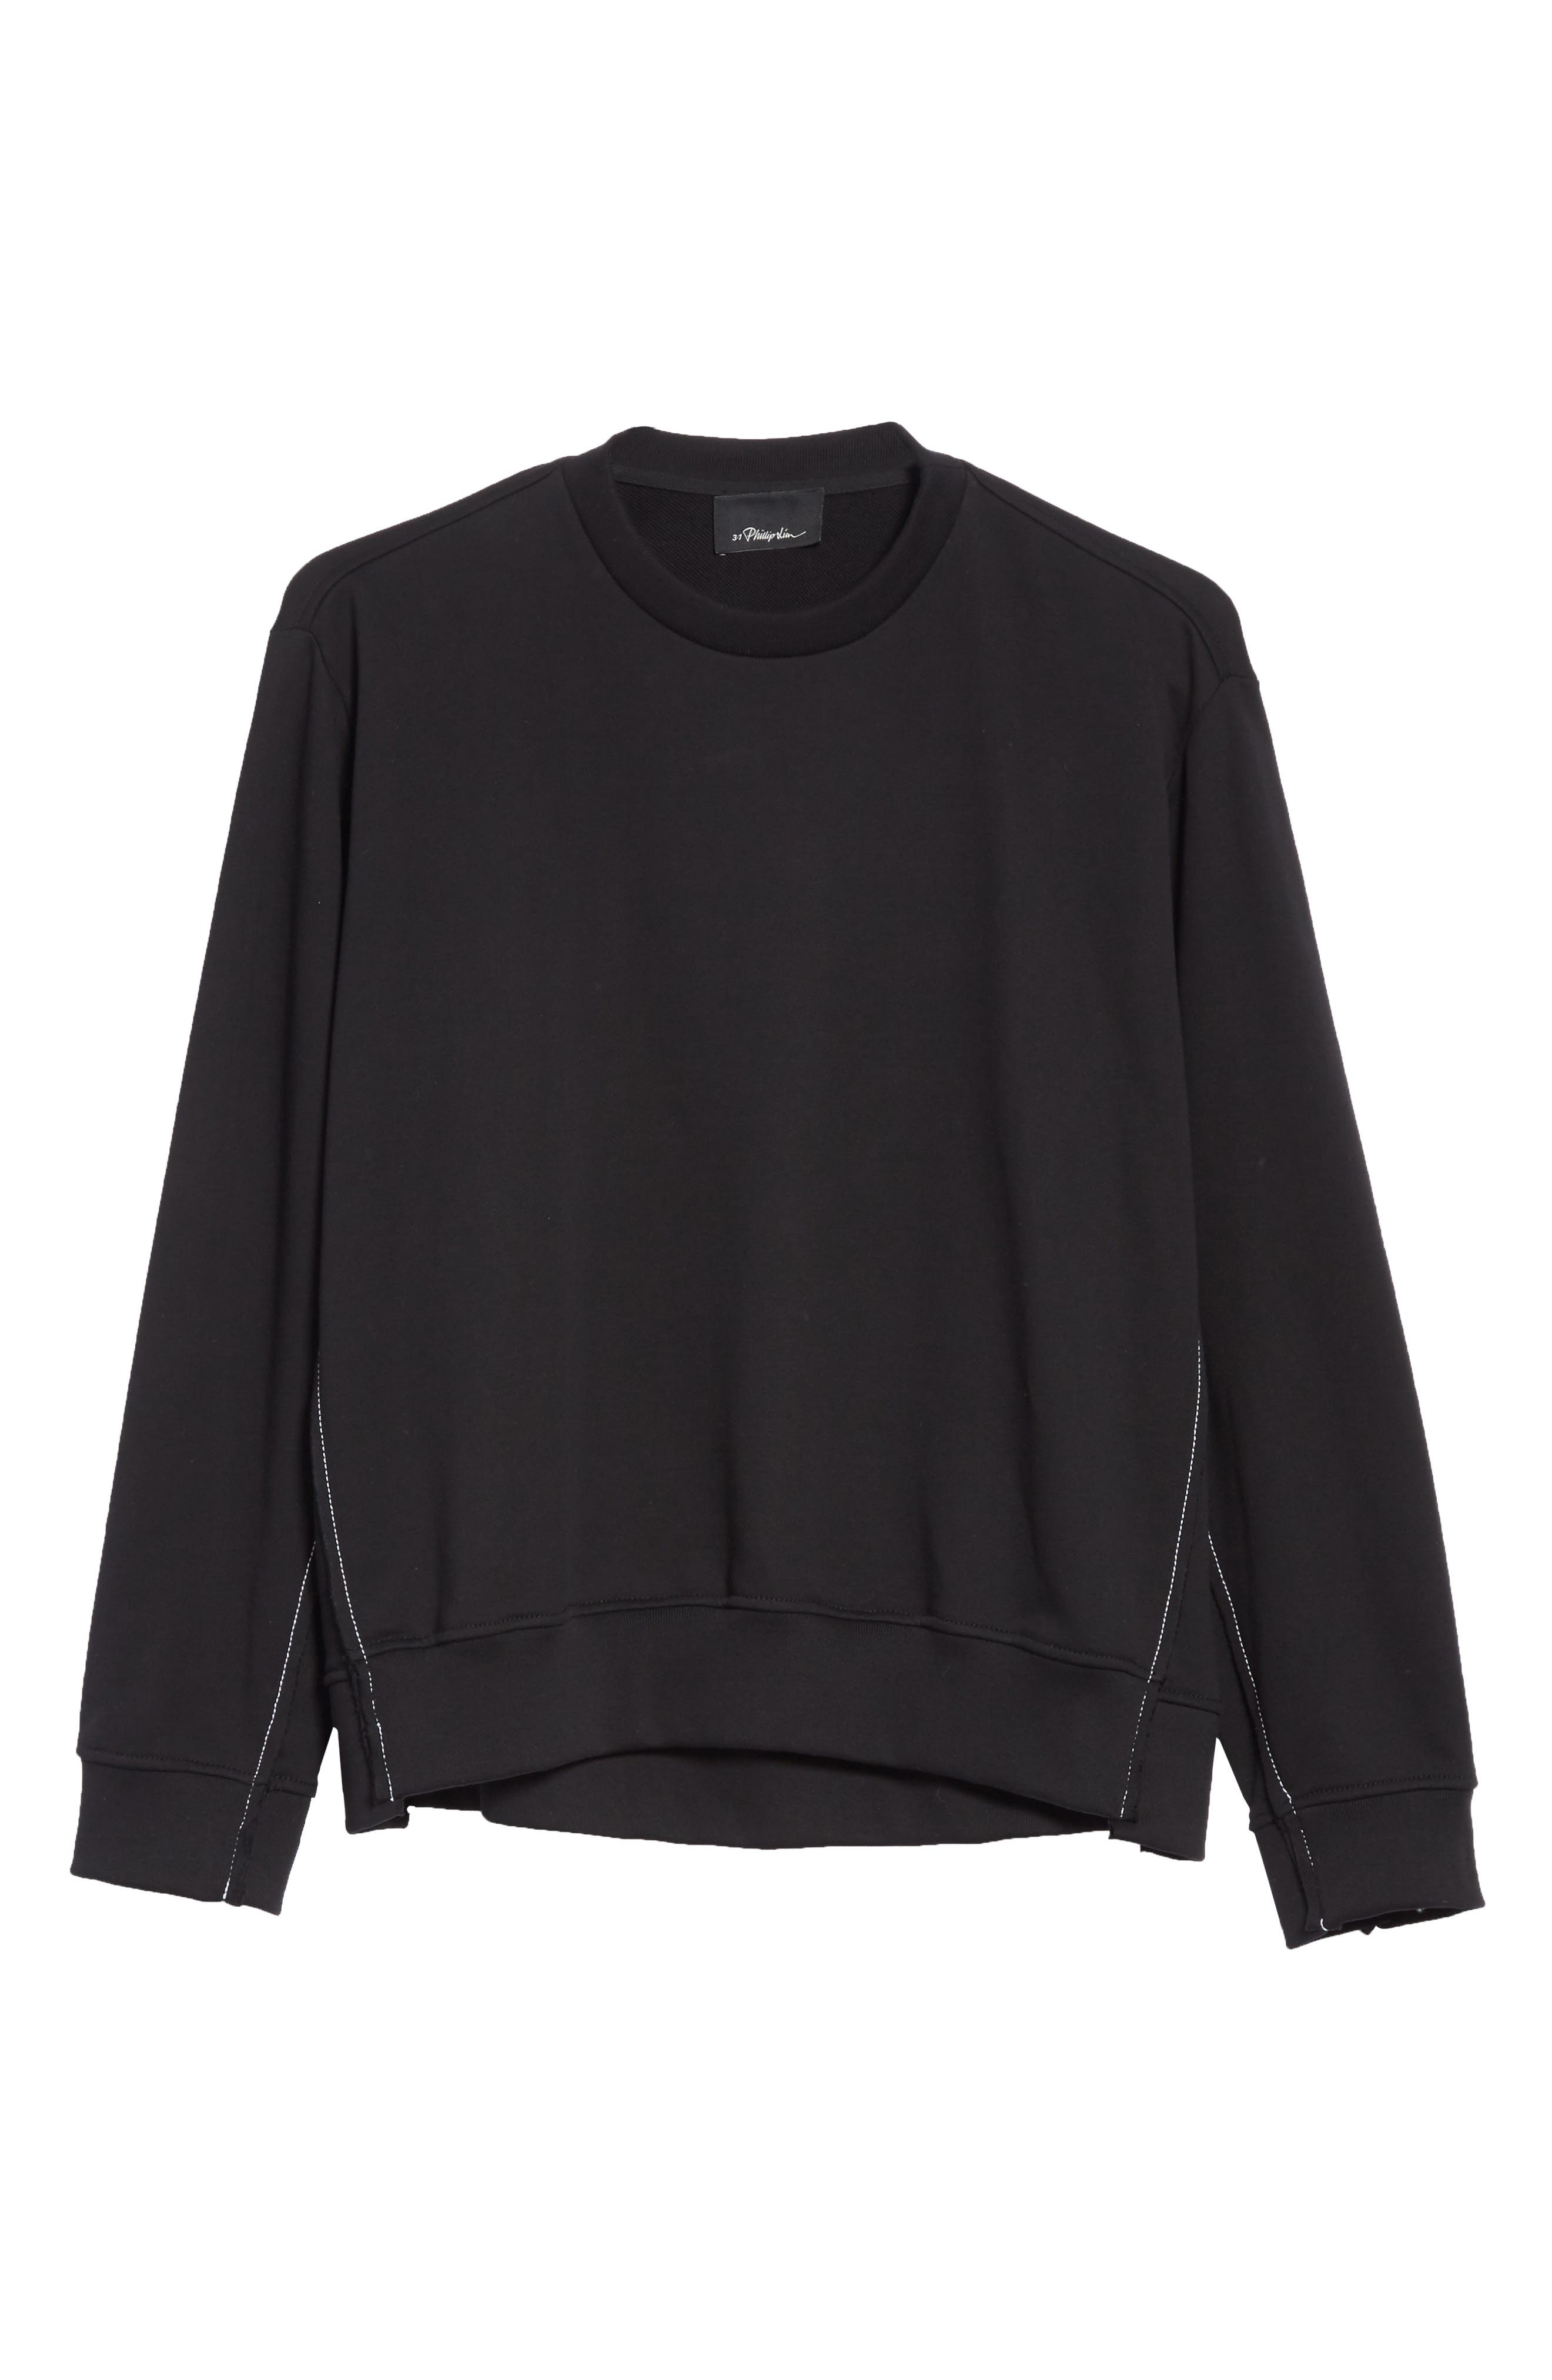 Reconstructed Crewneck Sweatshirt,                             Alternate thumbnail 6, color,                             001